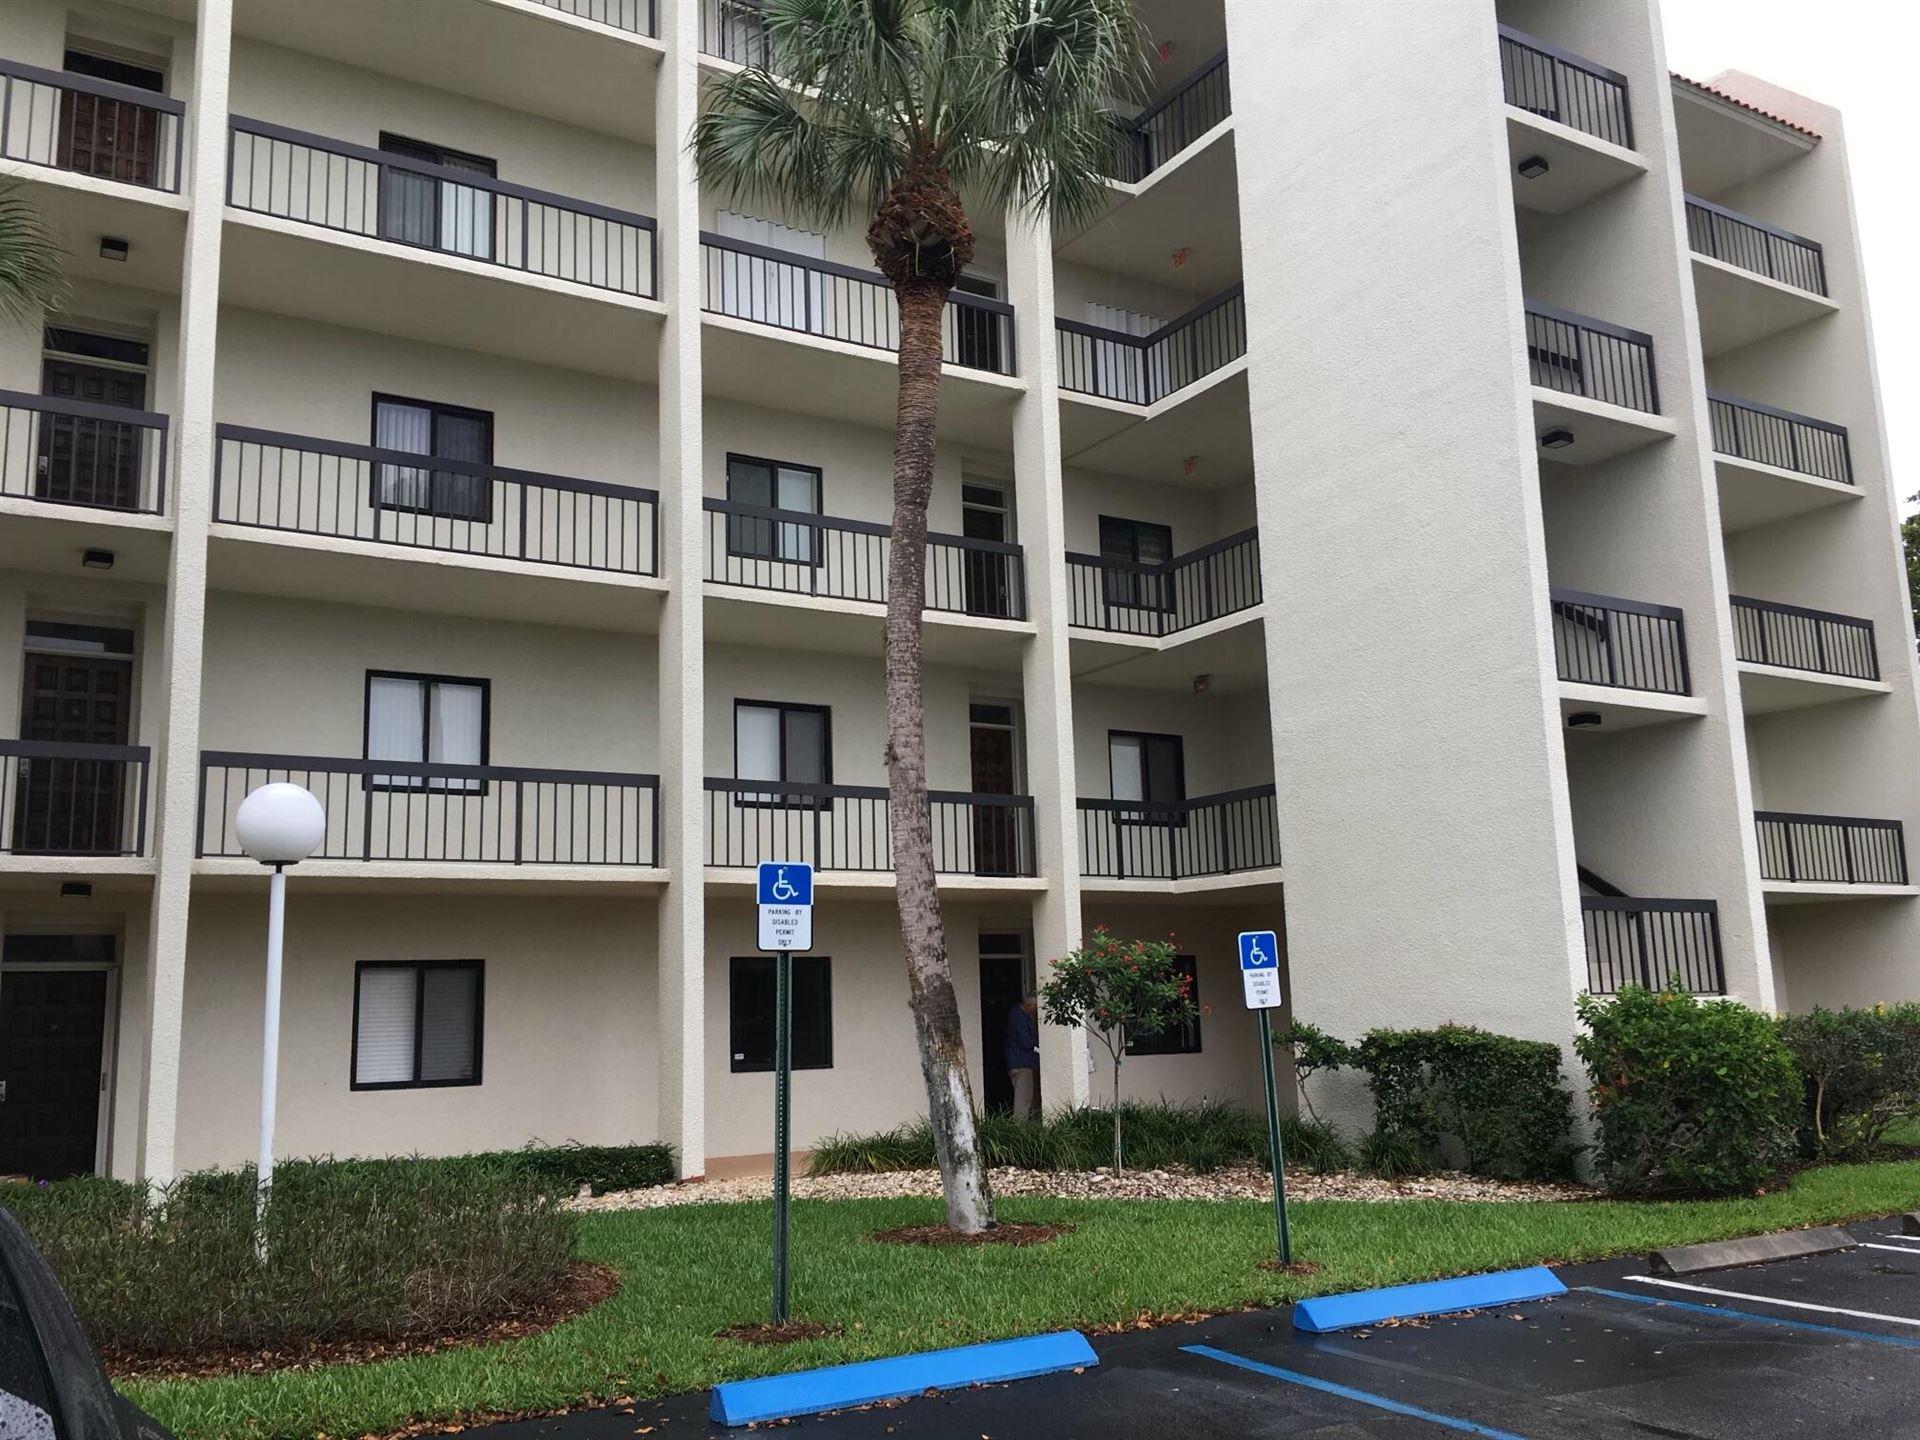 3000 Presidential Way #106, West Palm Beach, FL 33401 - #: RX-10691885